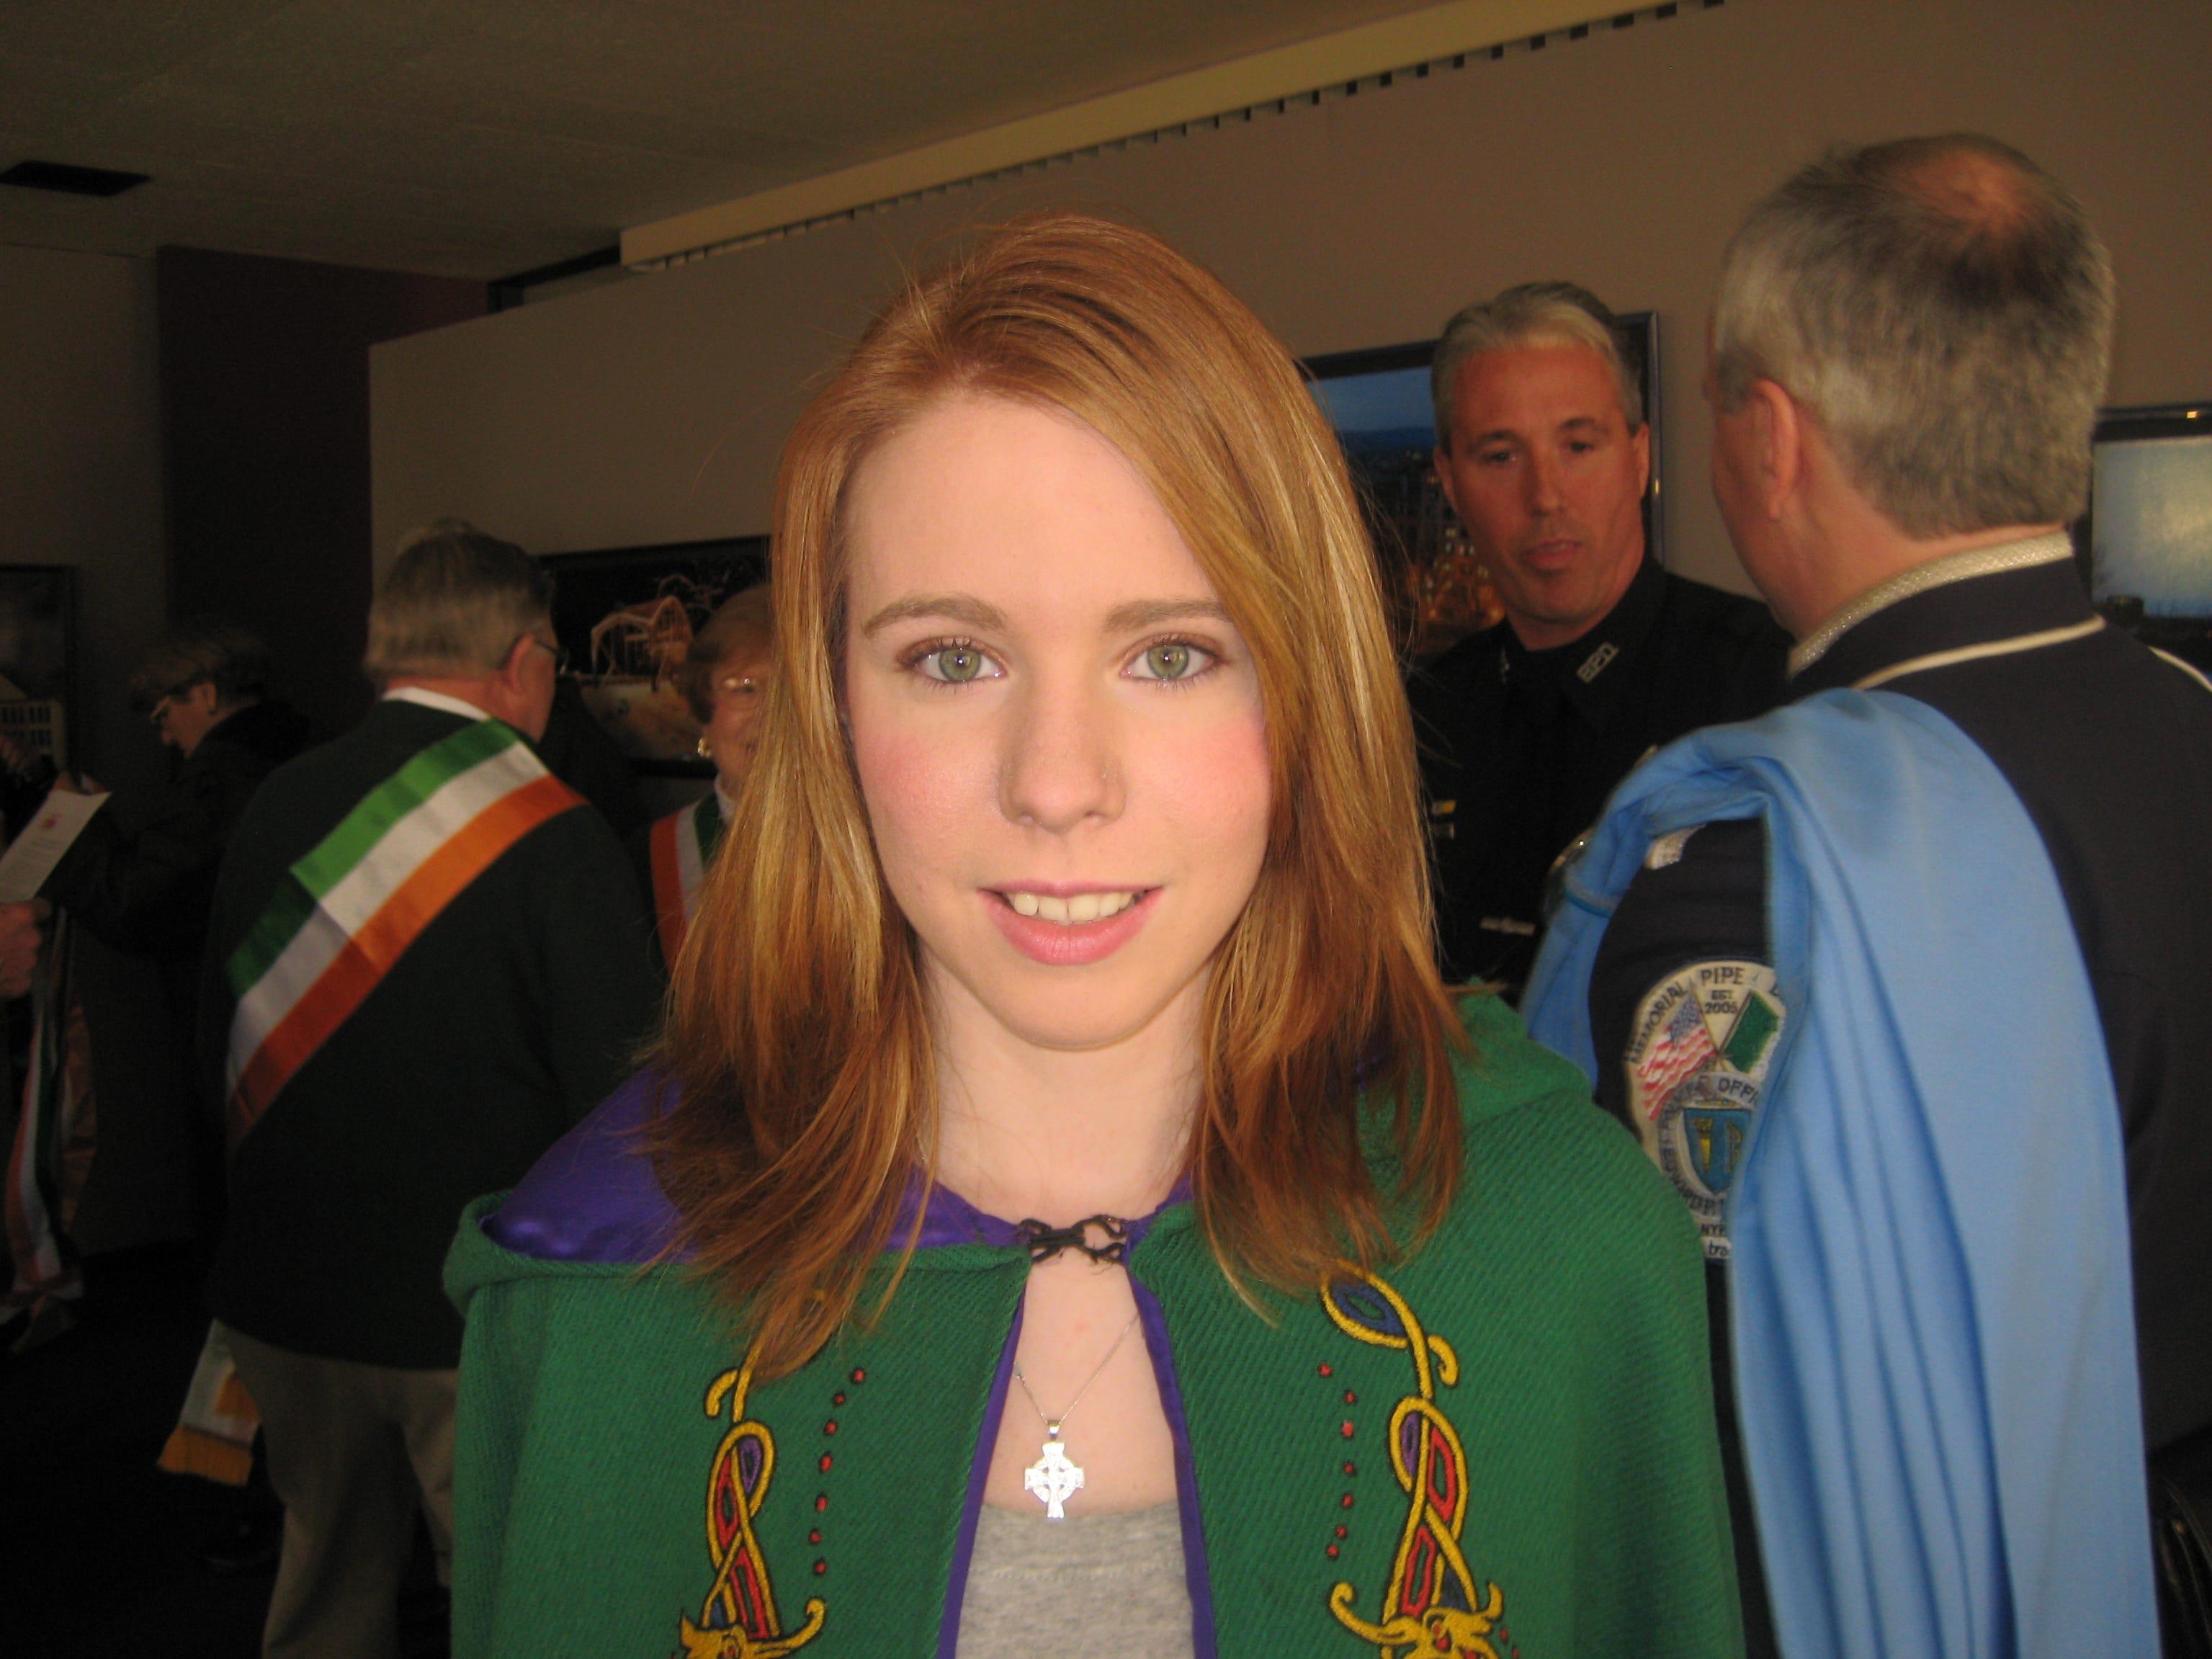 2010: Erin Katlin Mikulski, the Maid of Erin, in this Saturday's St. Patrick's Day Parade in Binghamton.